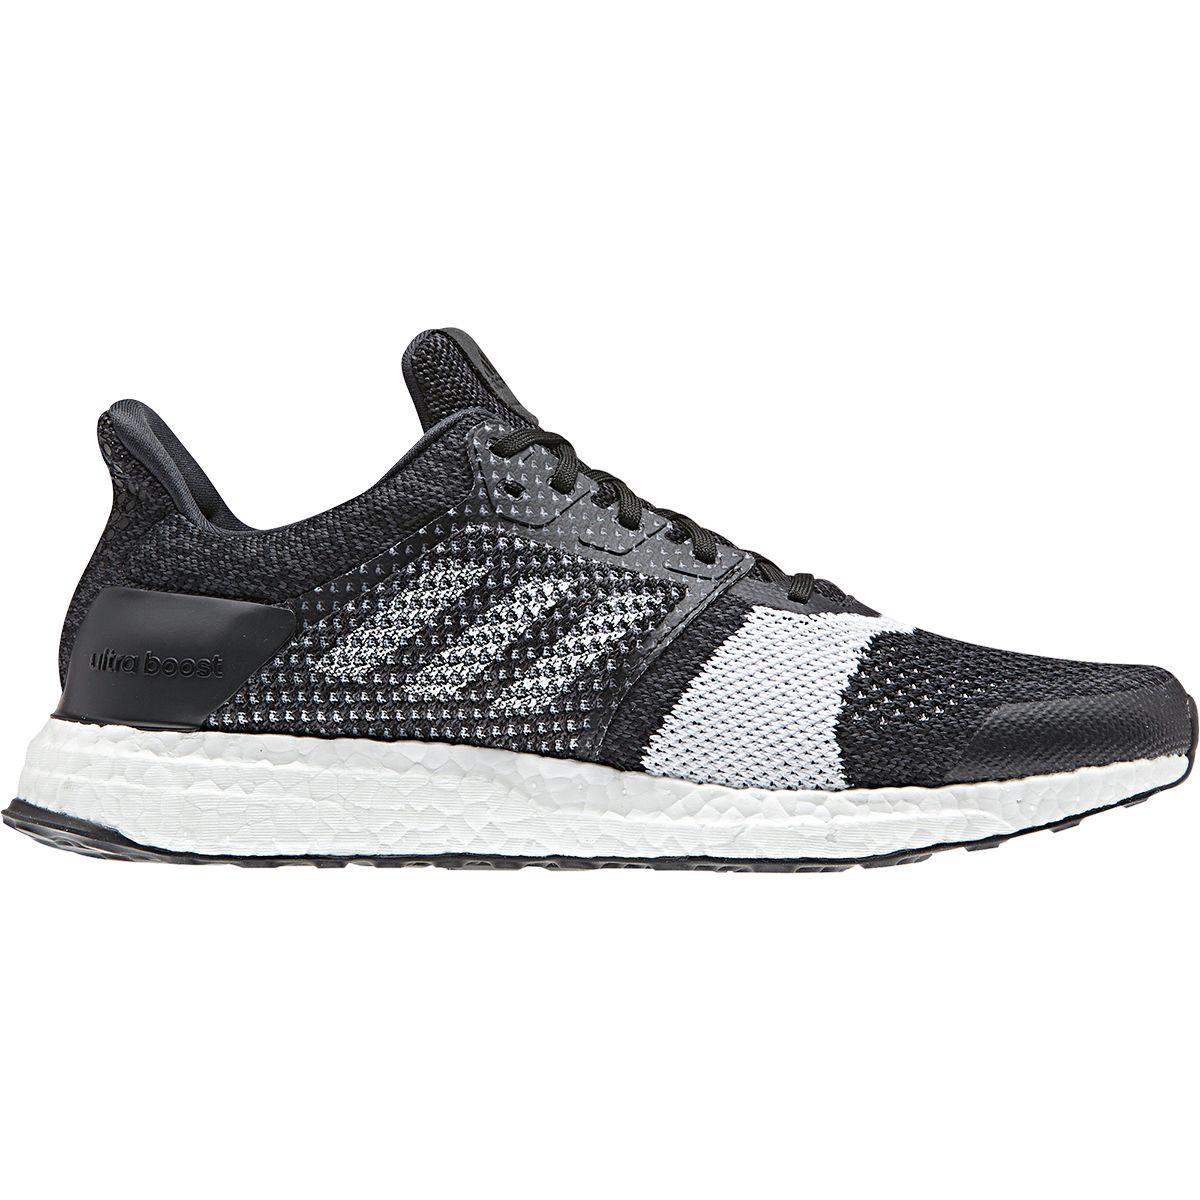 buy online 5fbaa 9cf56 Adidas Ultra Boost ST Running Shoe - Men's   Backcountry.com